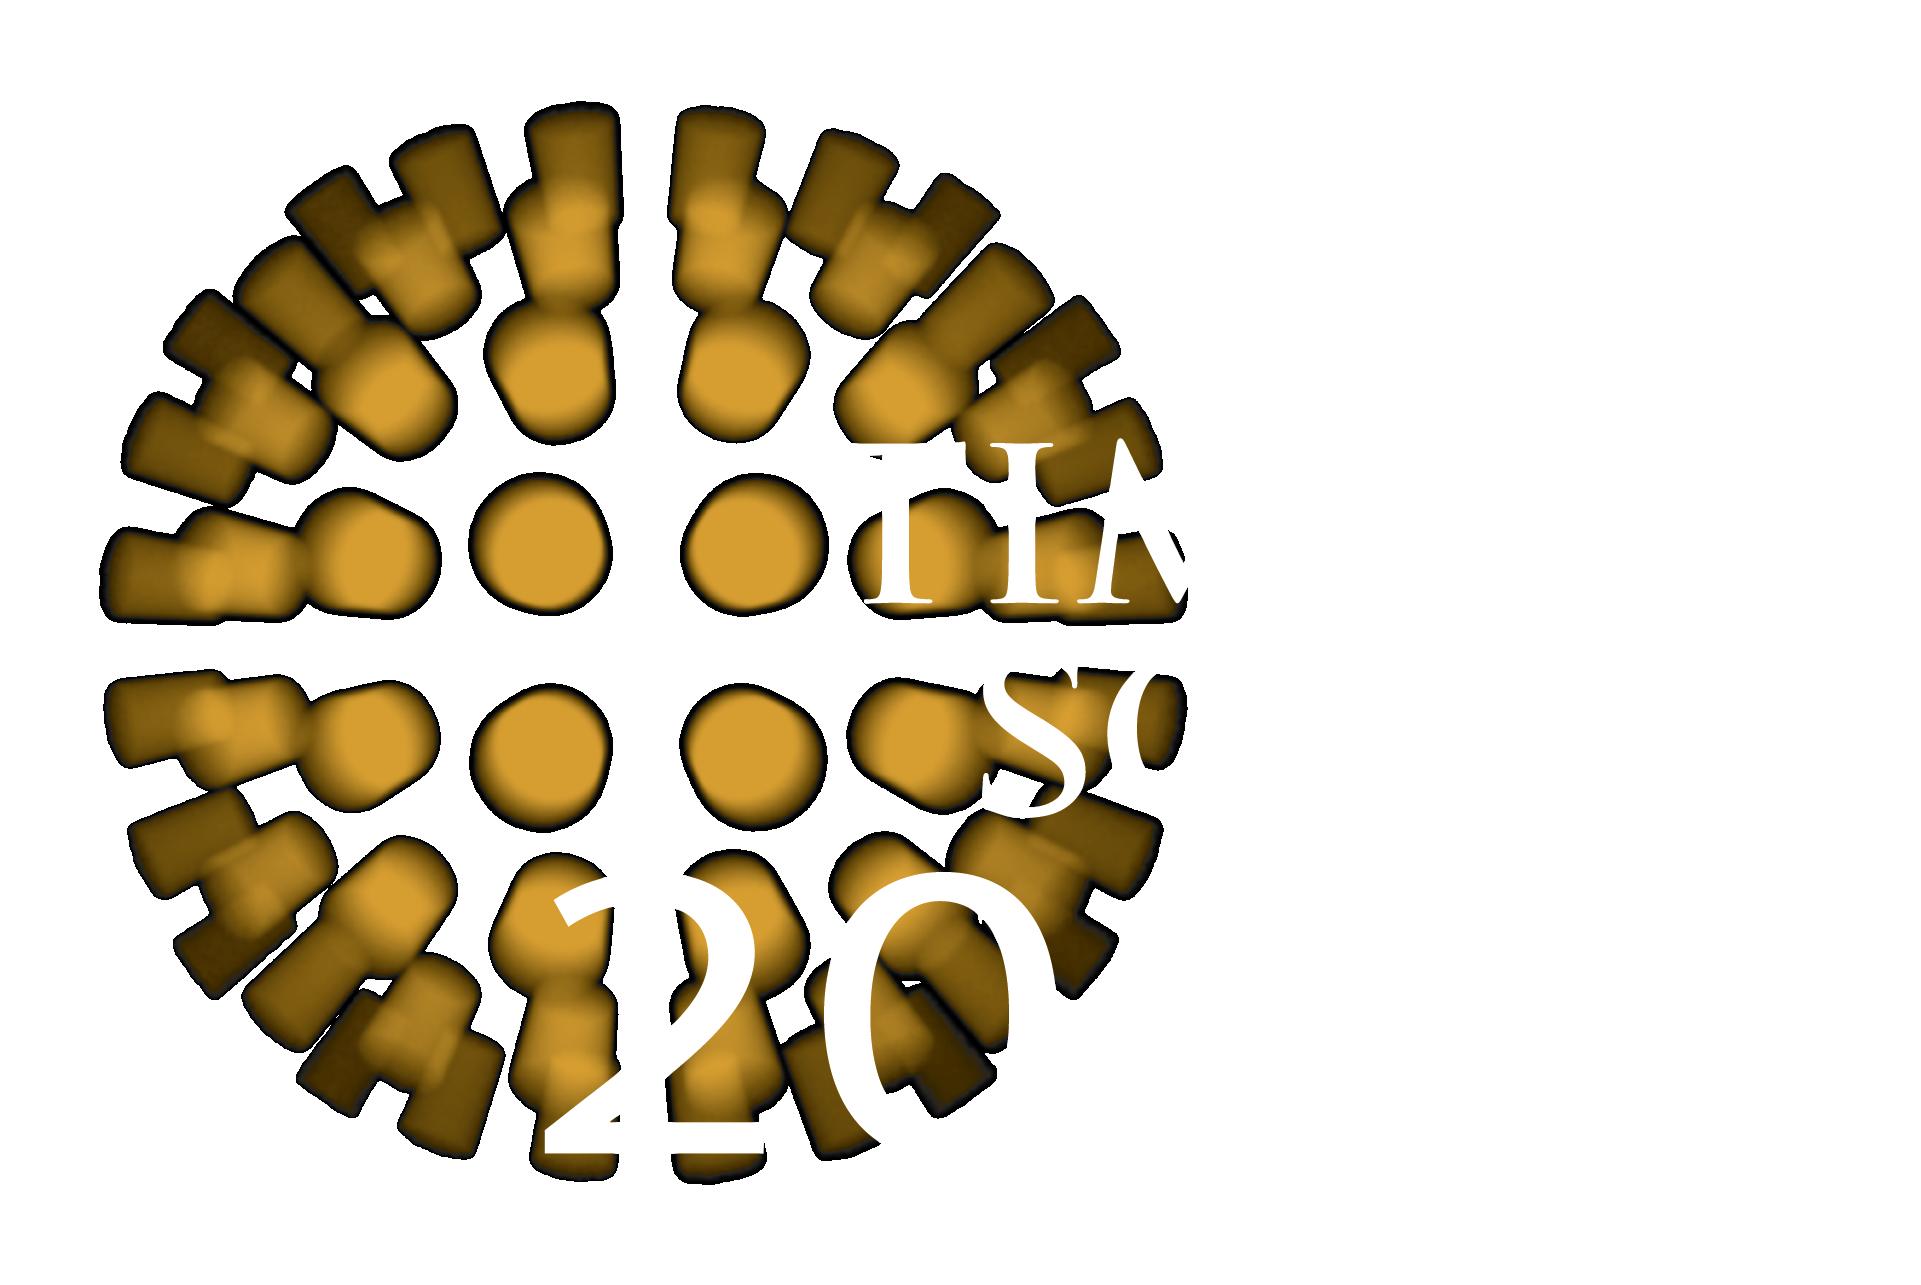 New Year clipart confetti Over Times Eve Square Send